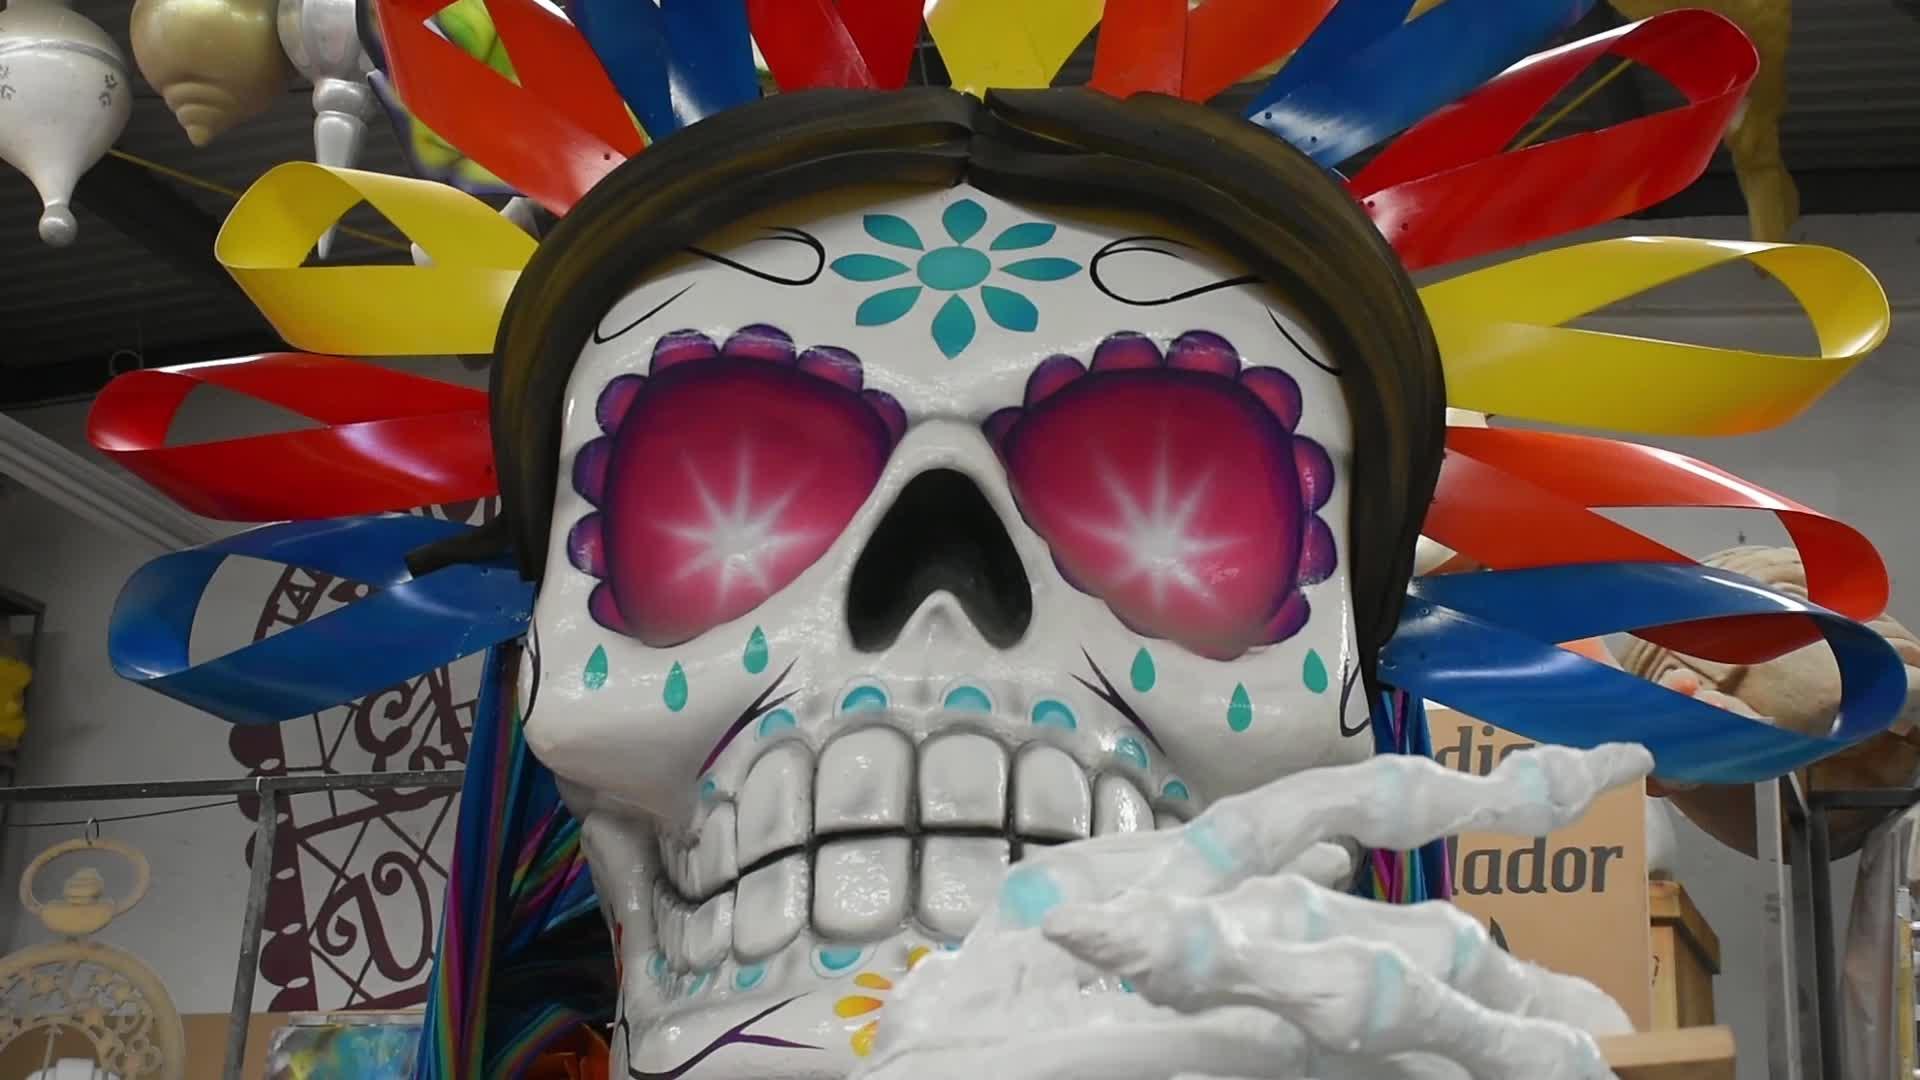 The Dead Parade preparation in Mexico city